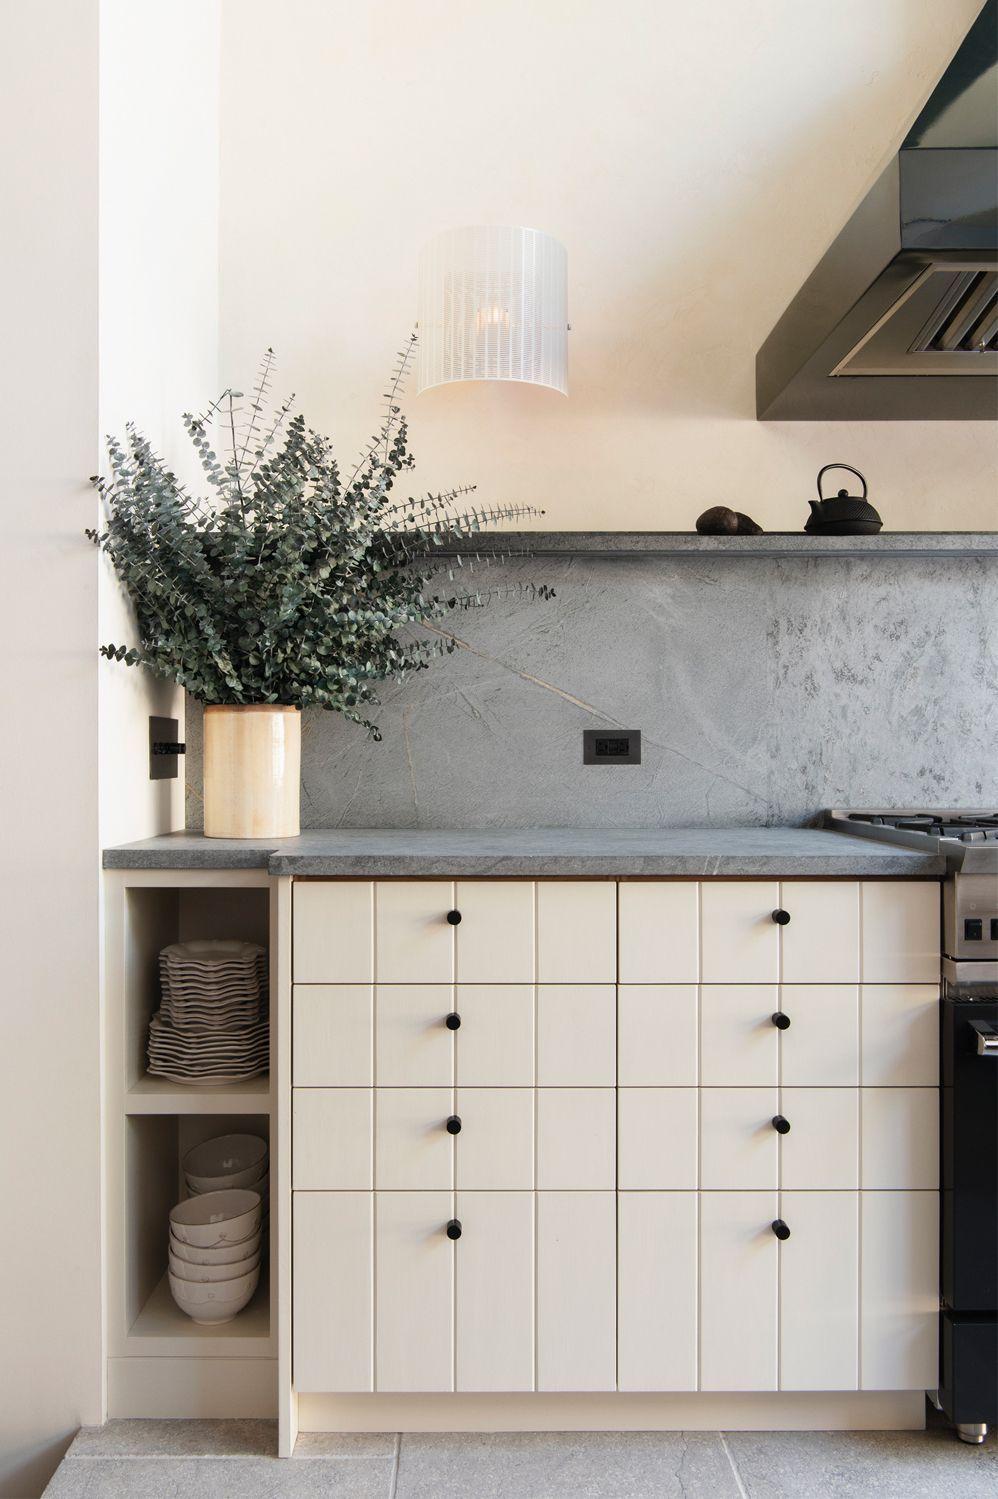 Kitchen Hardware Trends: Small Details